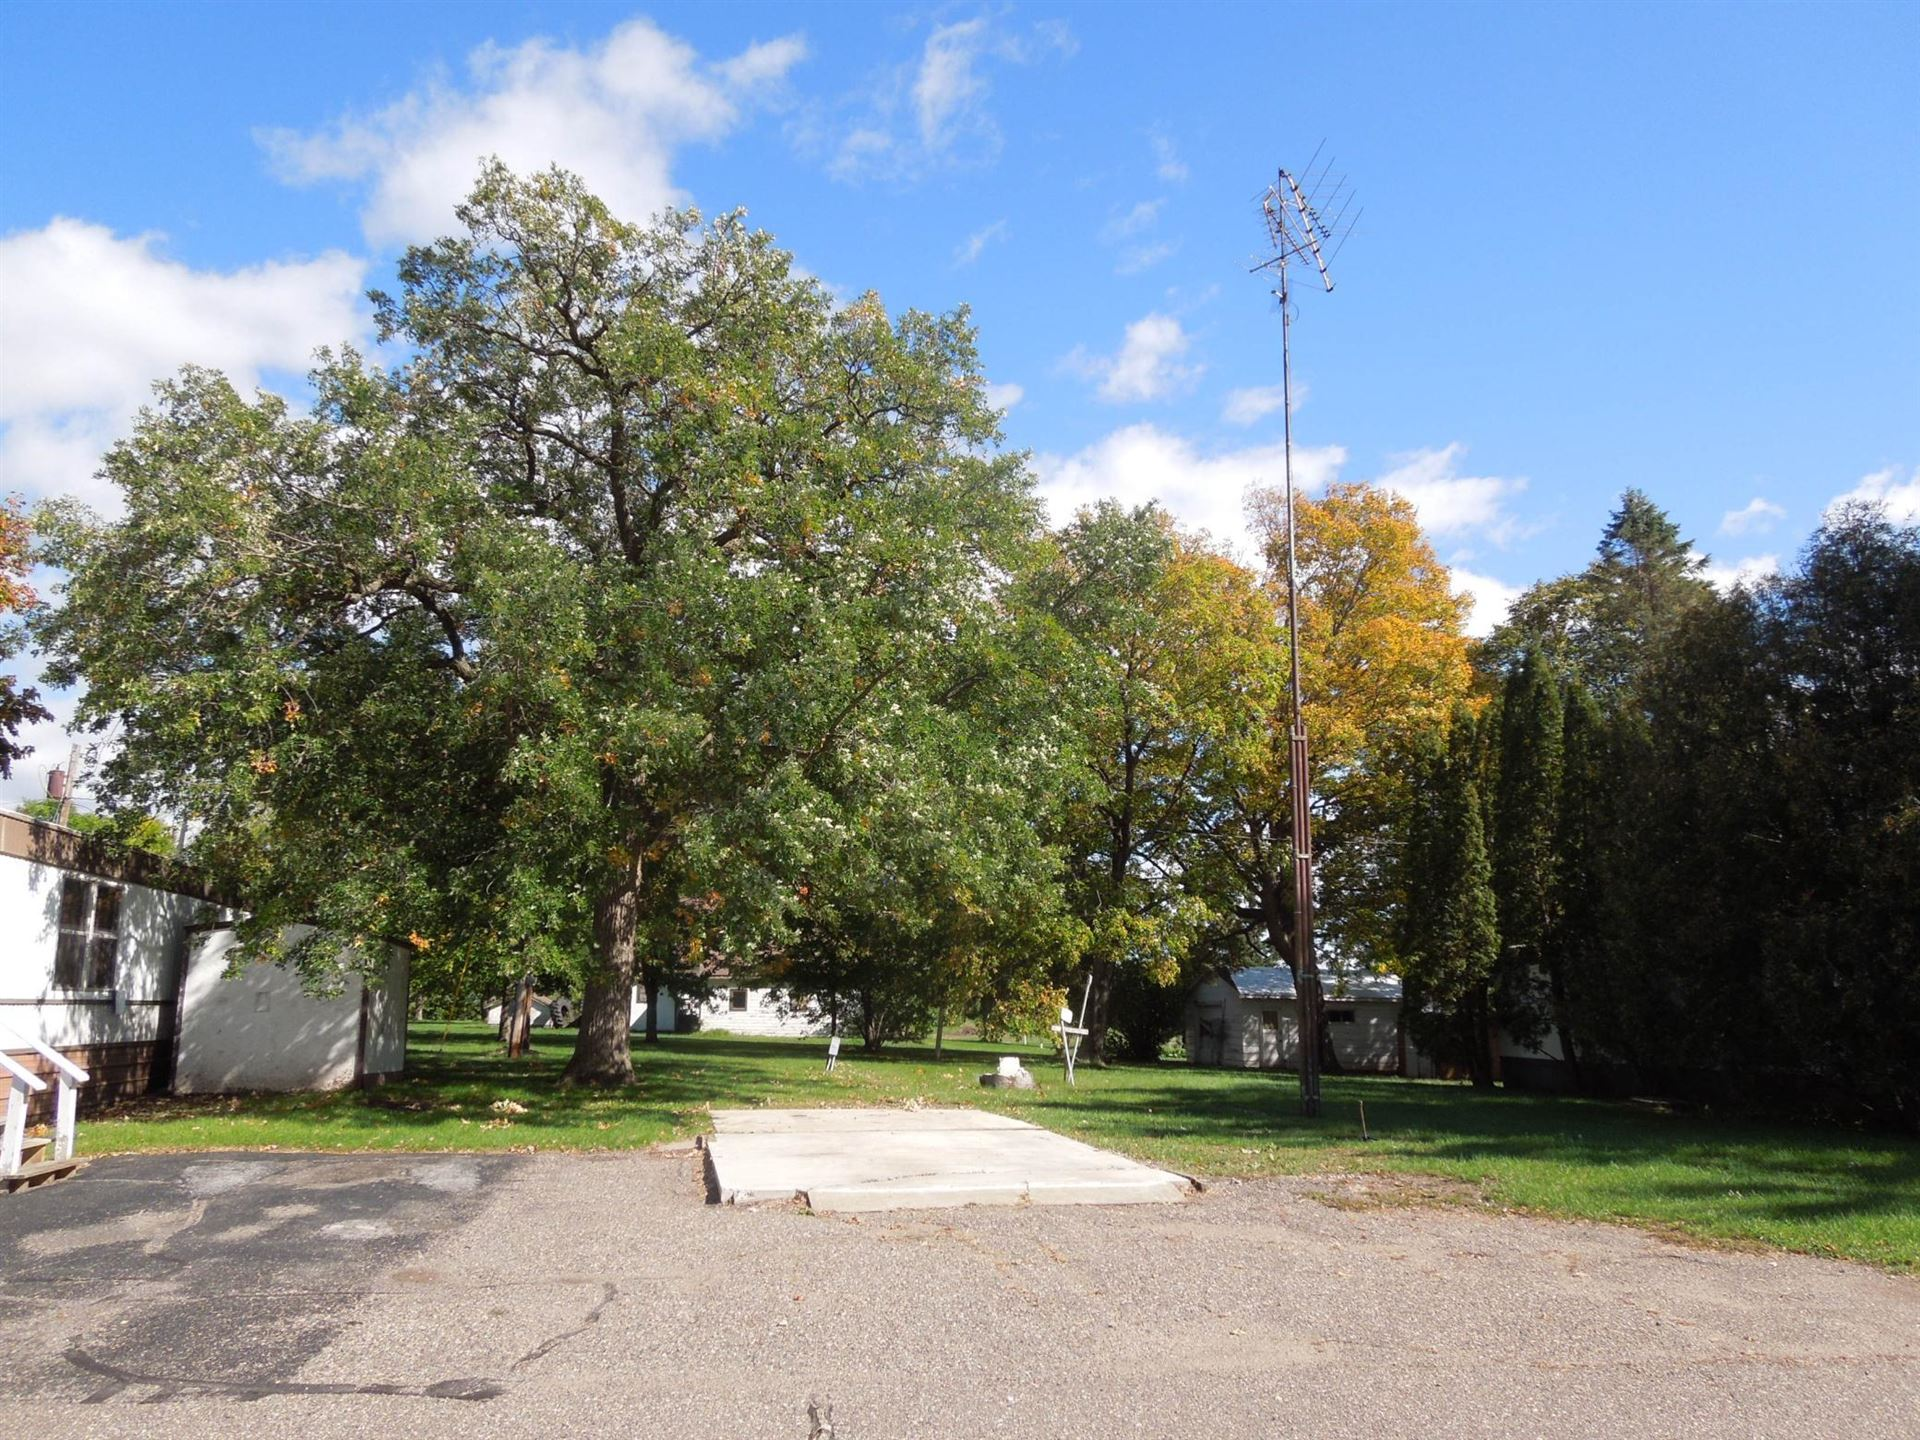 Photo of 321 West Street, Upsala, MN 56384 (MLS # 6103165)